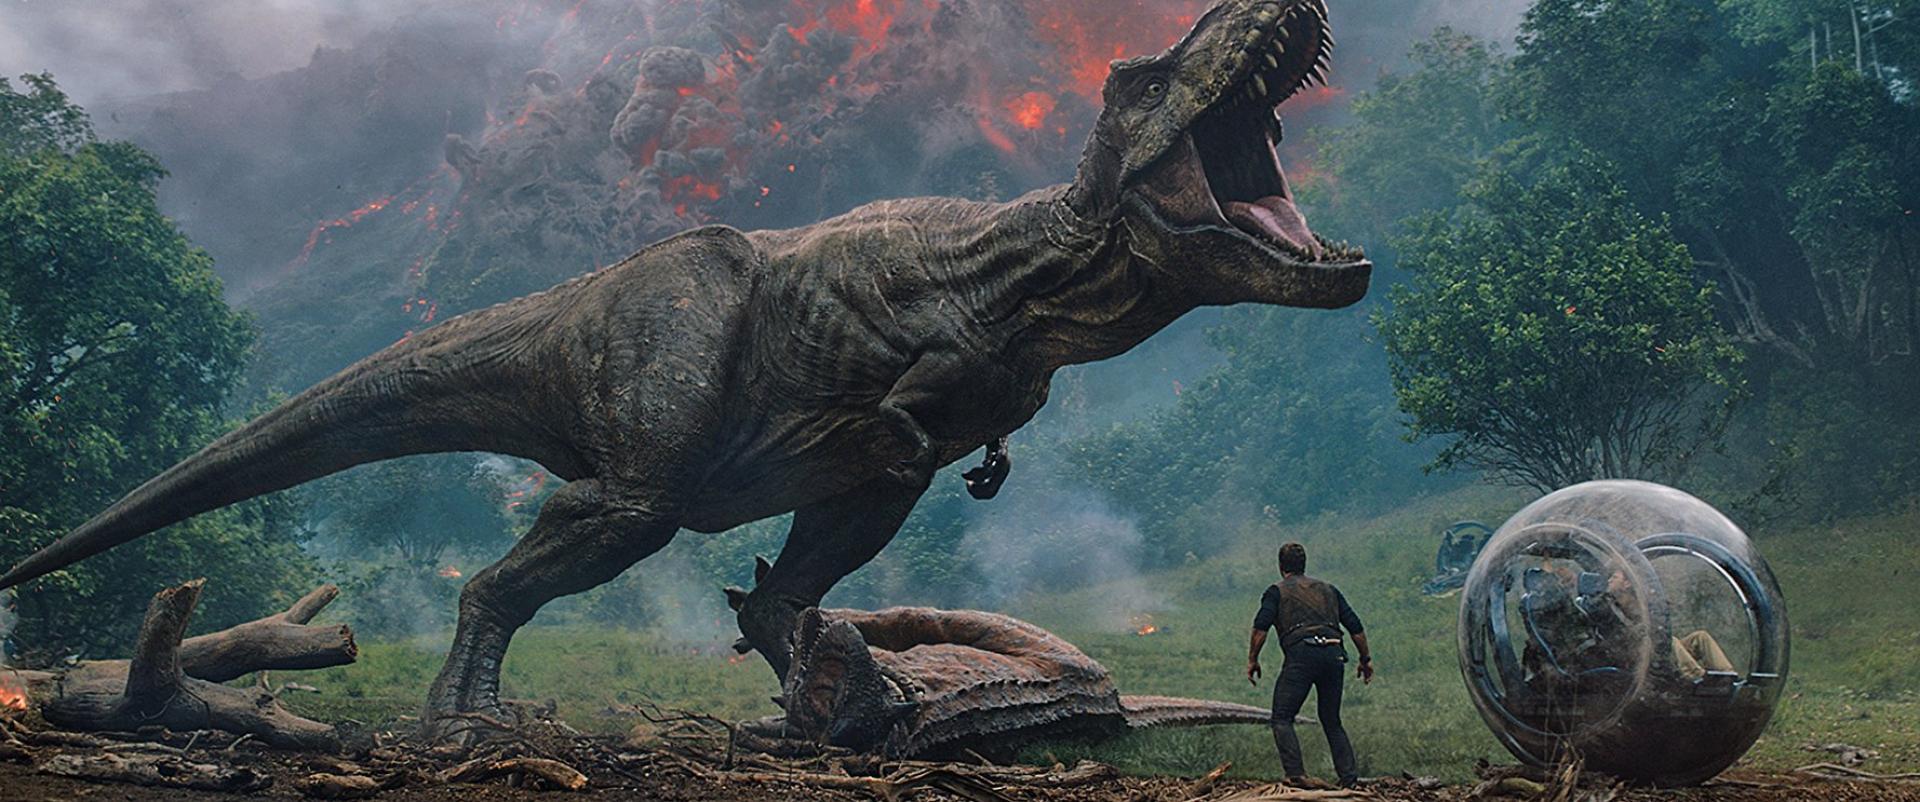 Jurassic World: Fallen Kingdom / Jurassic World – Bukott birodalom (2018)